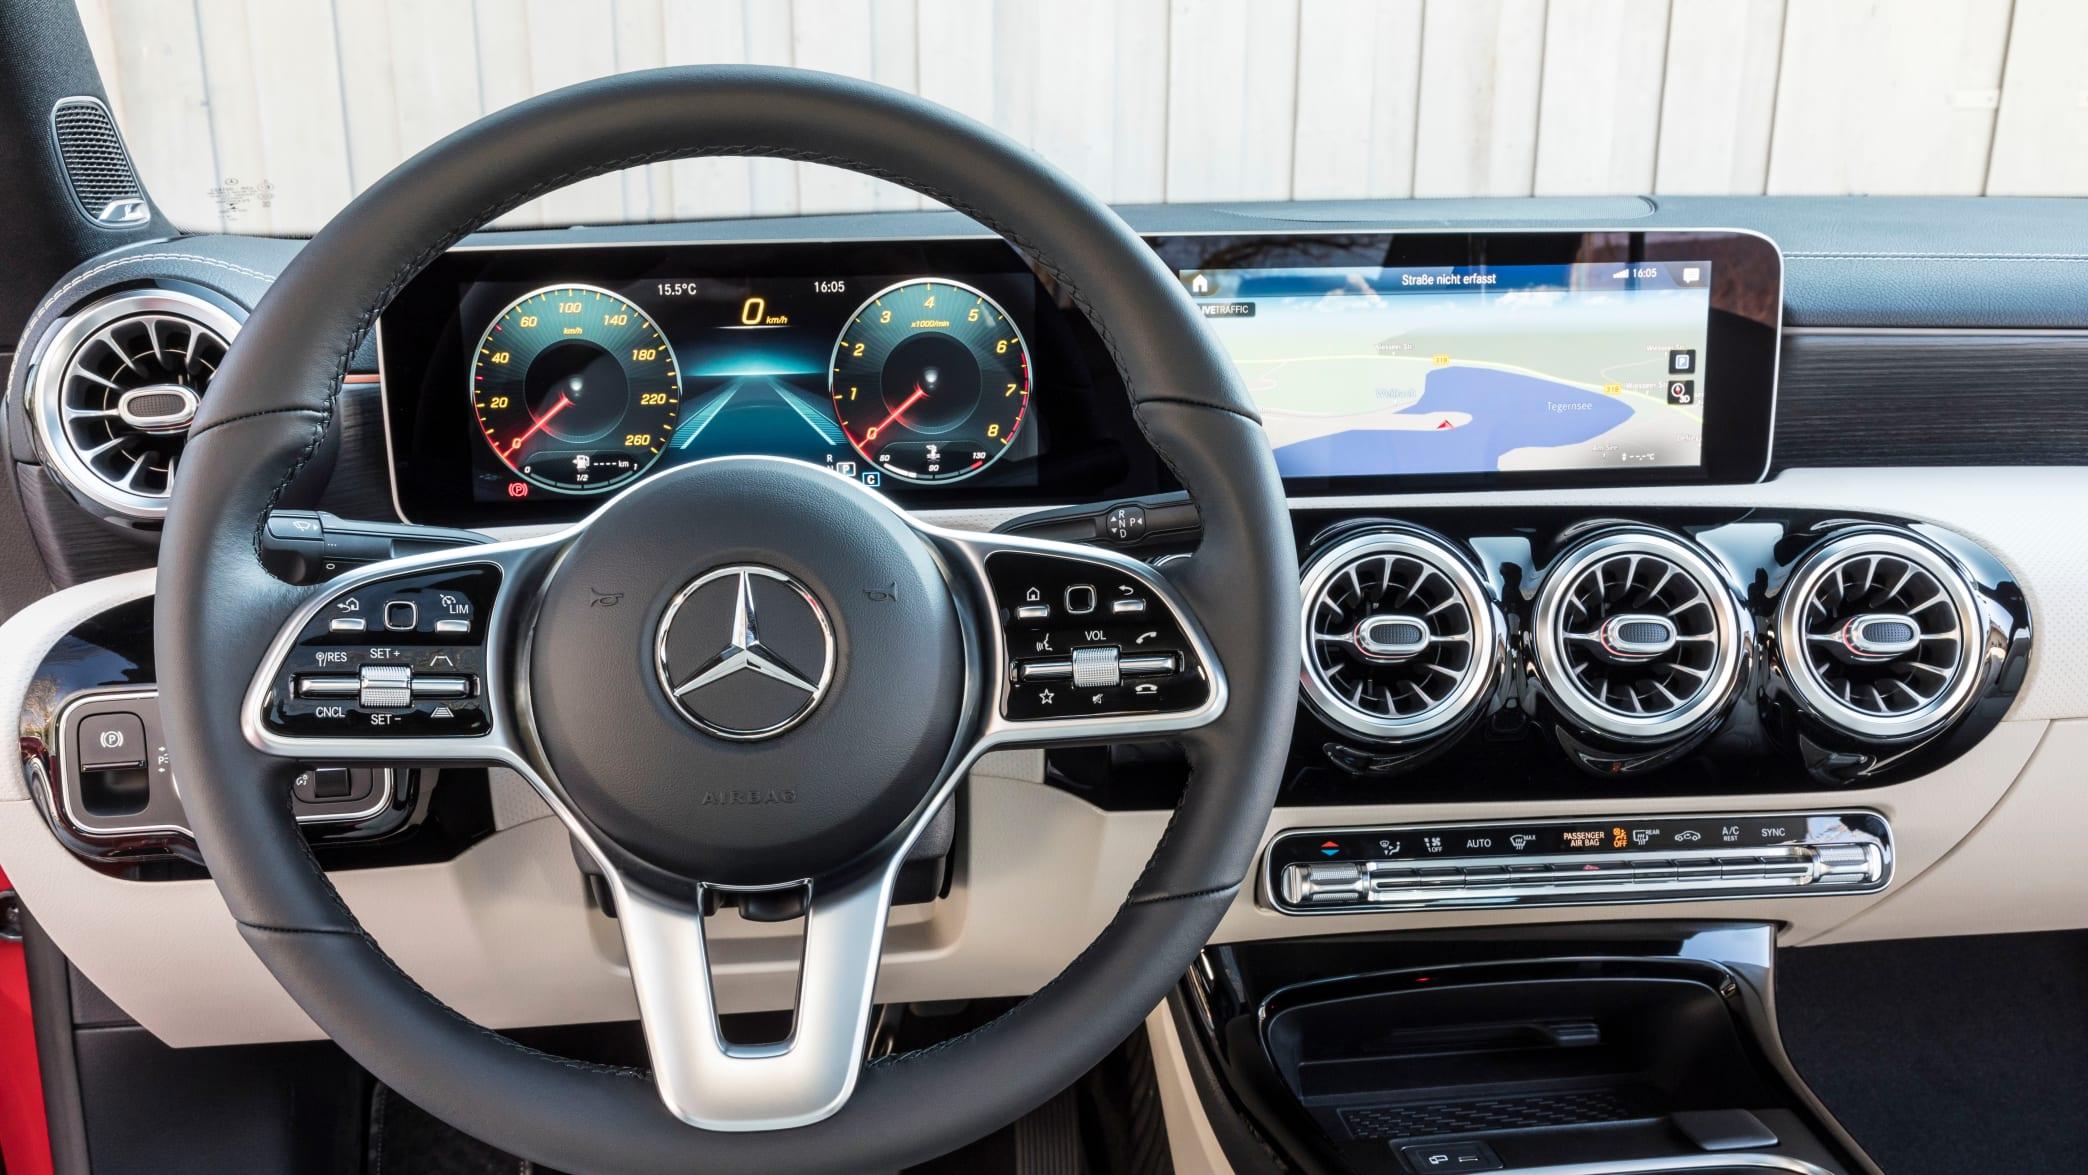 Cockpit Display eines Mercedes CLA Coupe